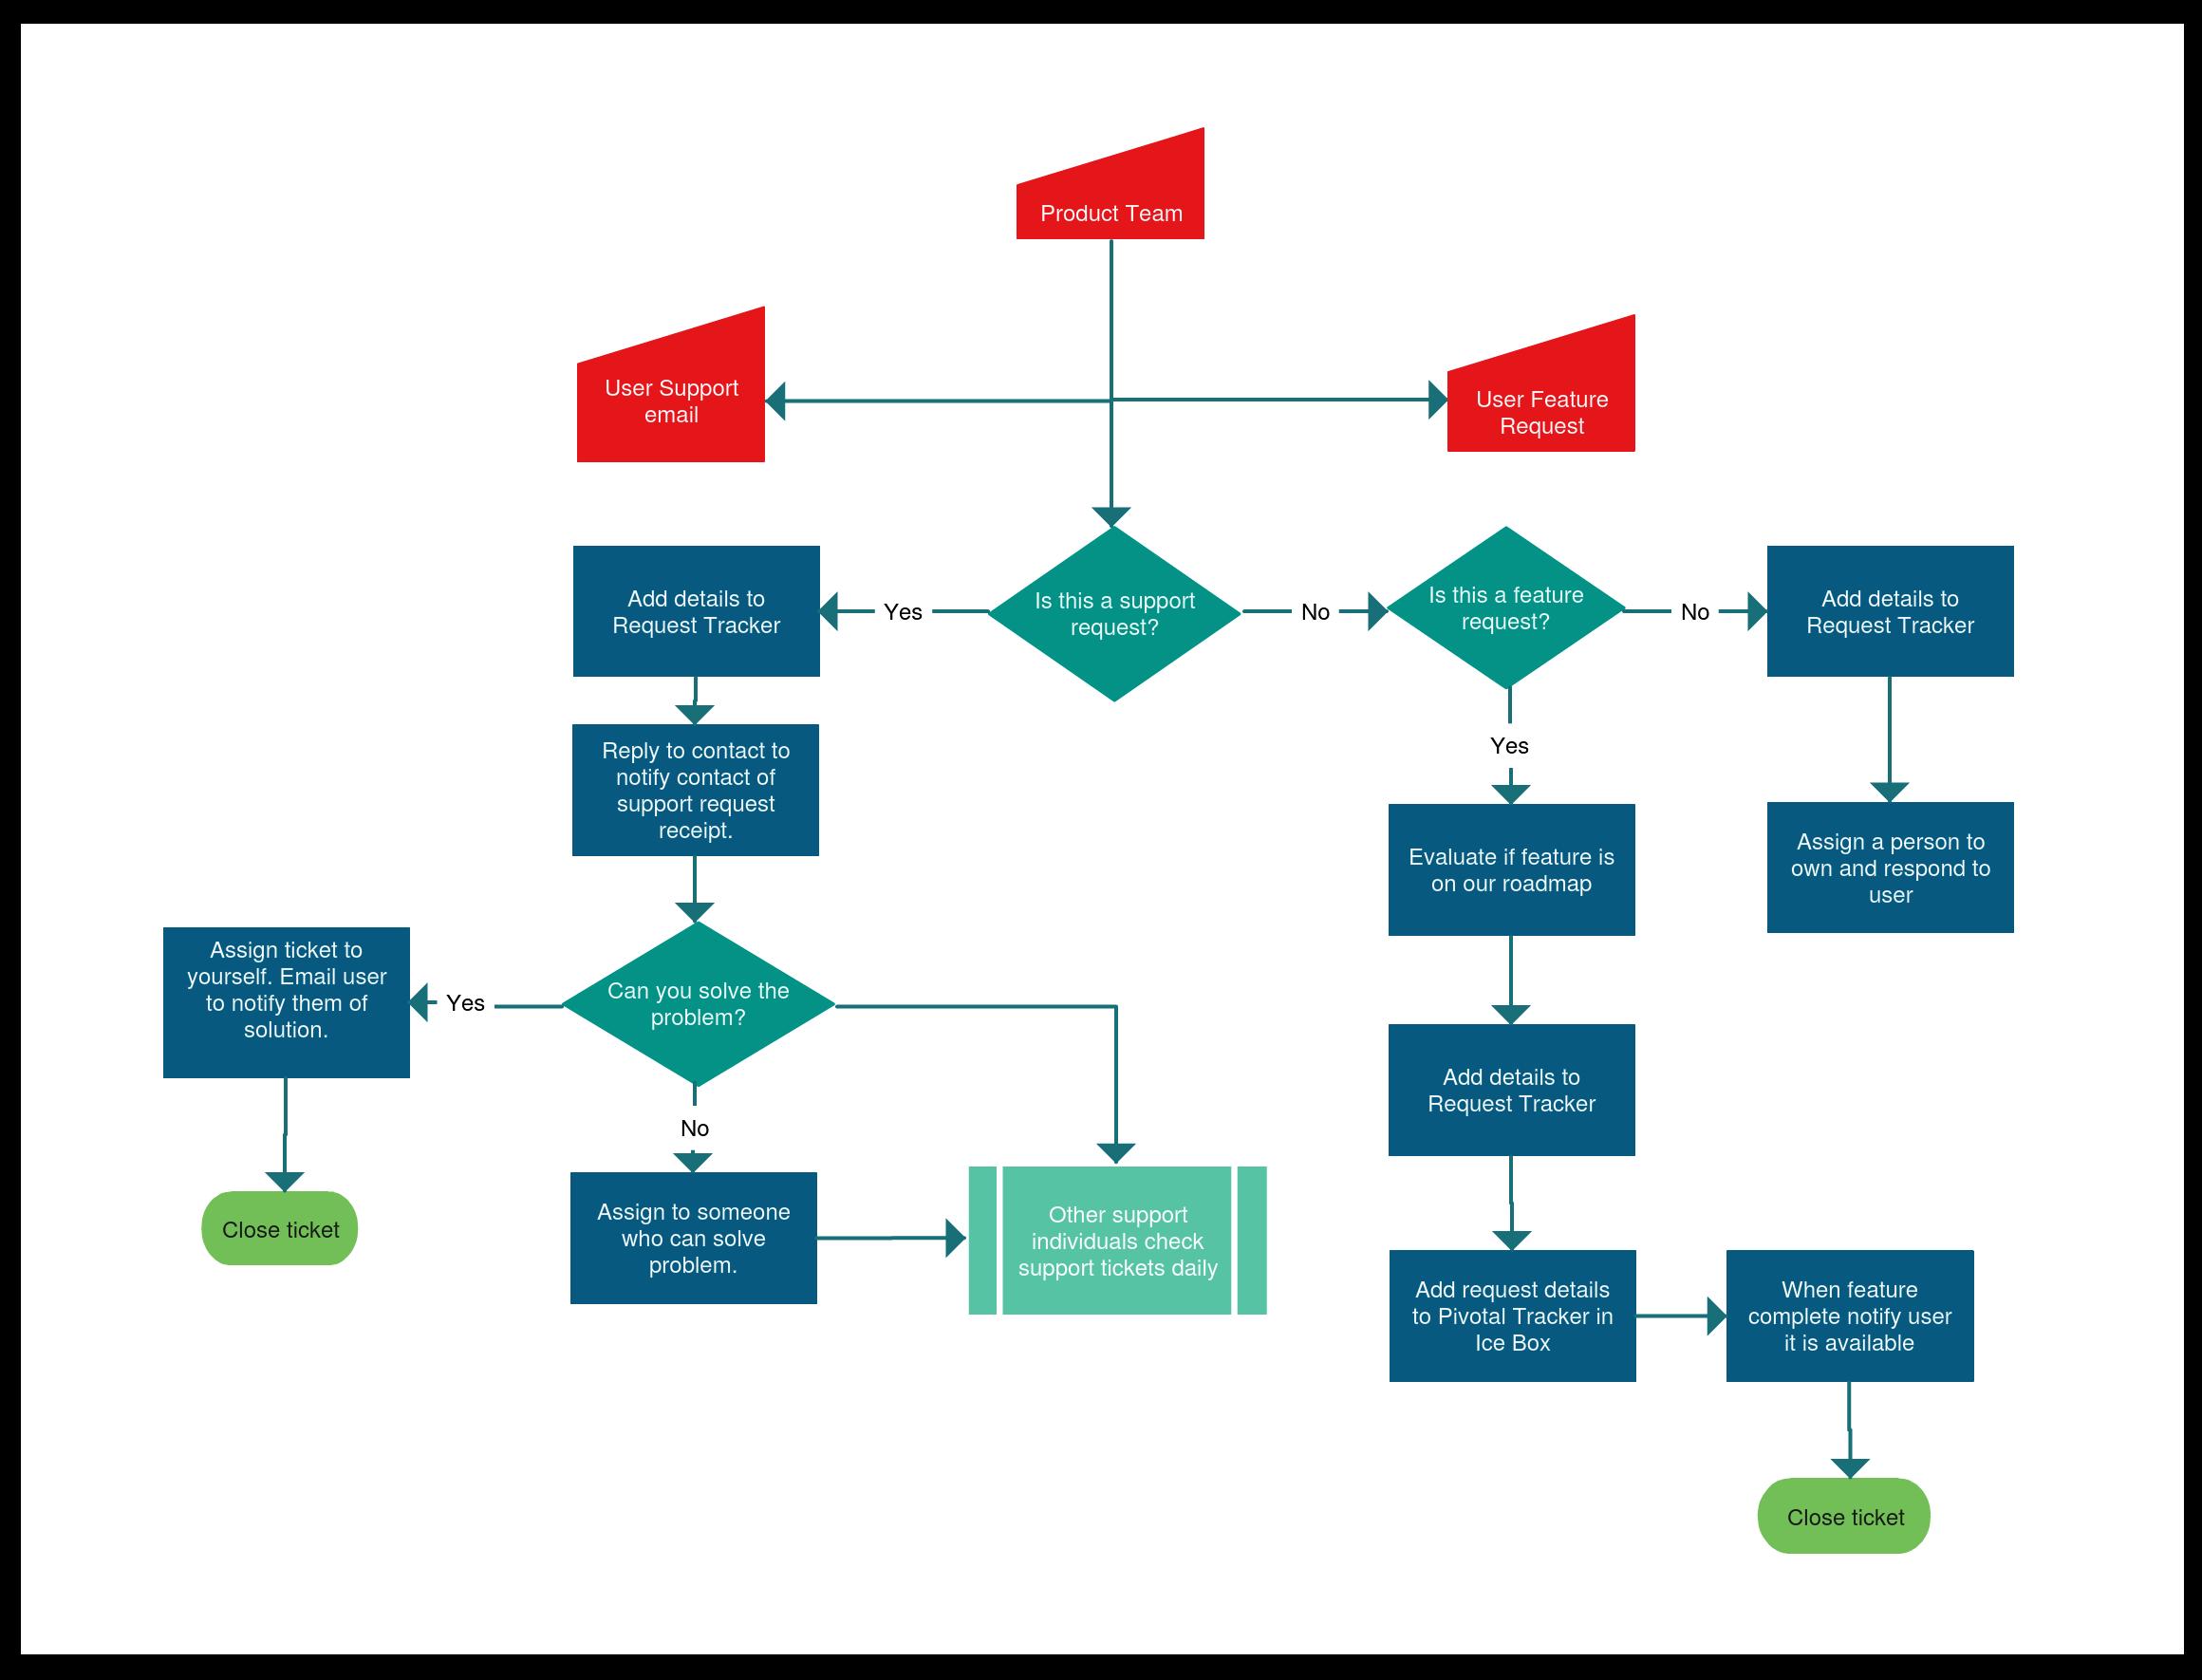 Flowchart templates examples in creately diagram community website also aprildearest rh